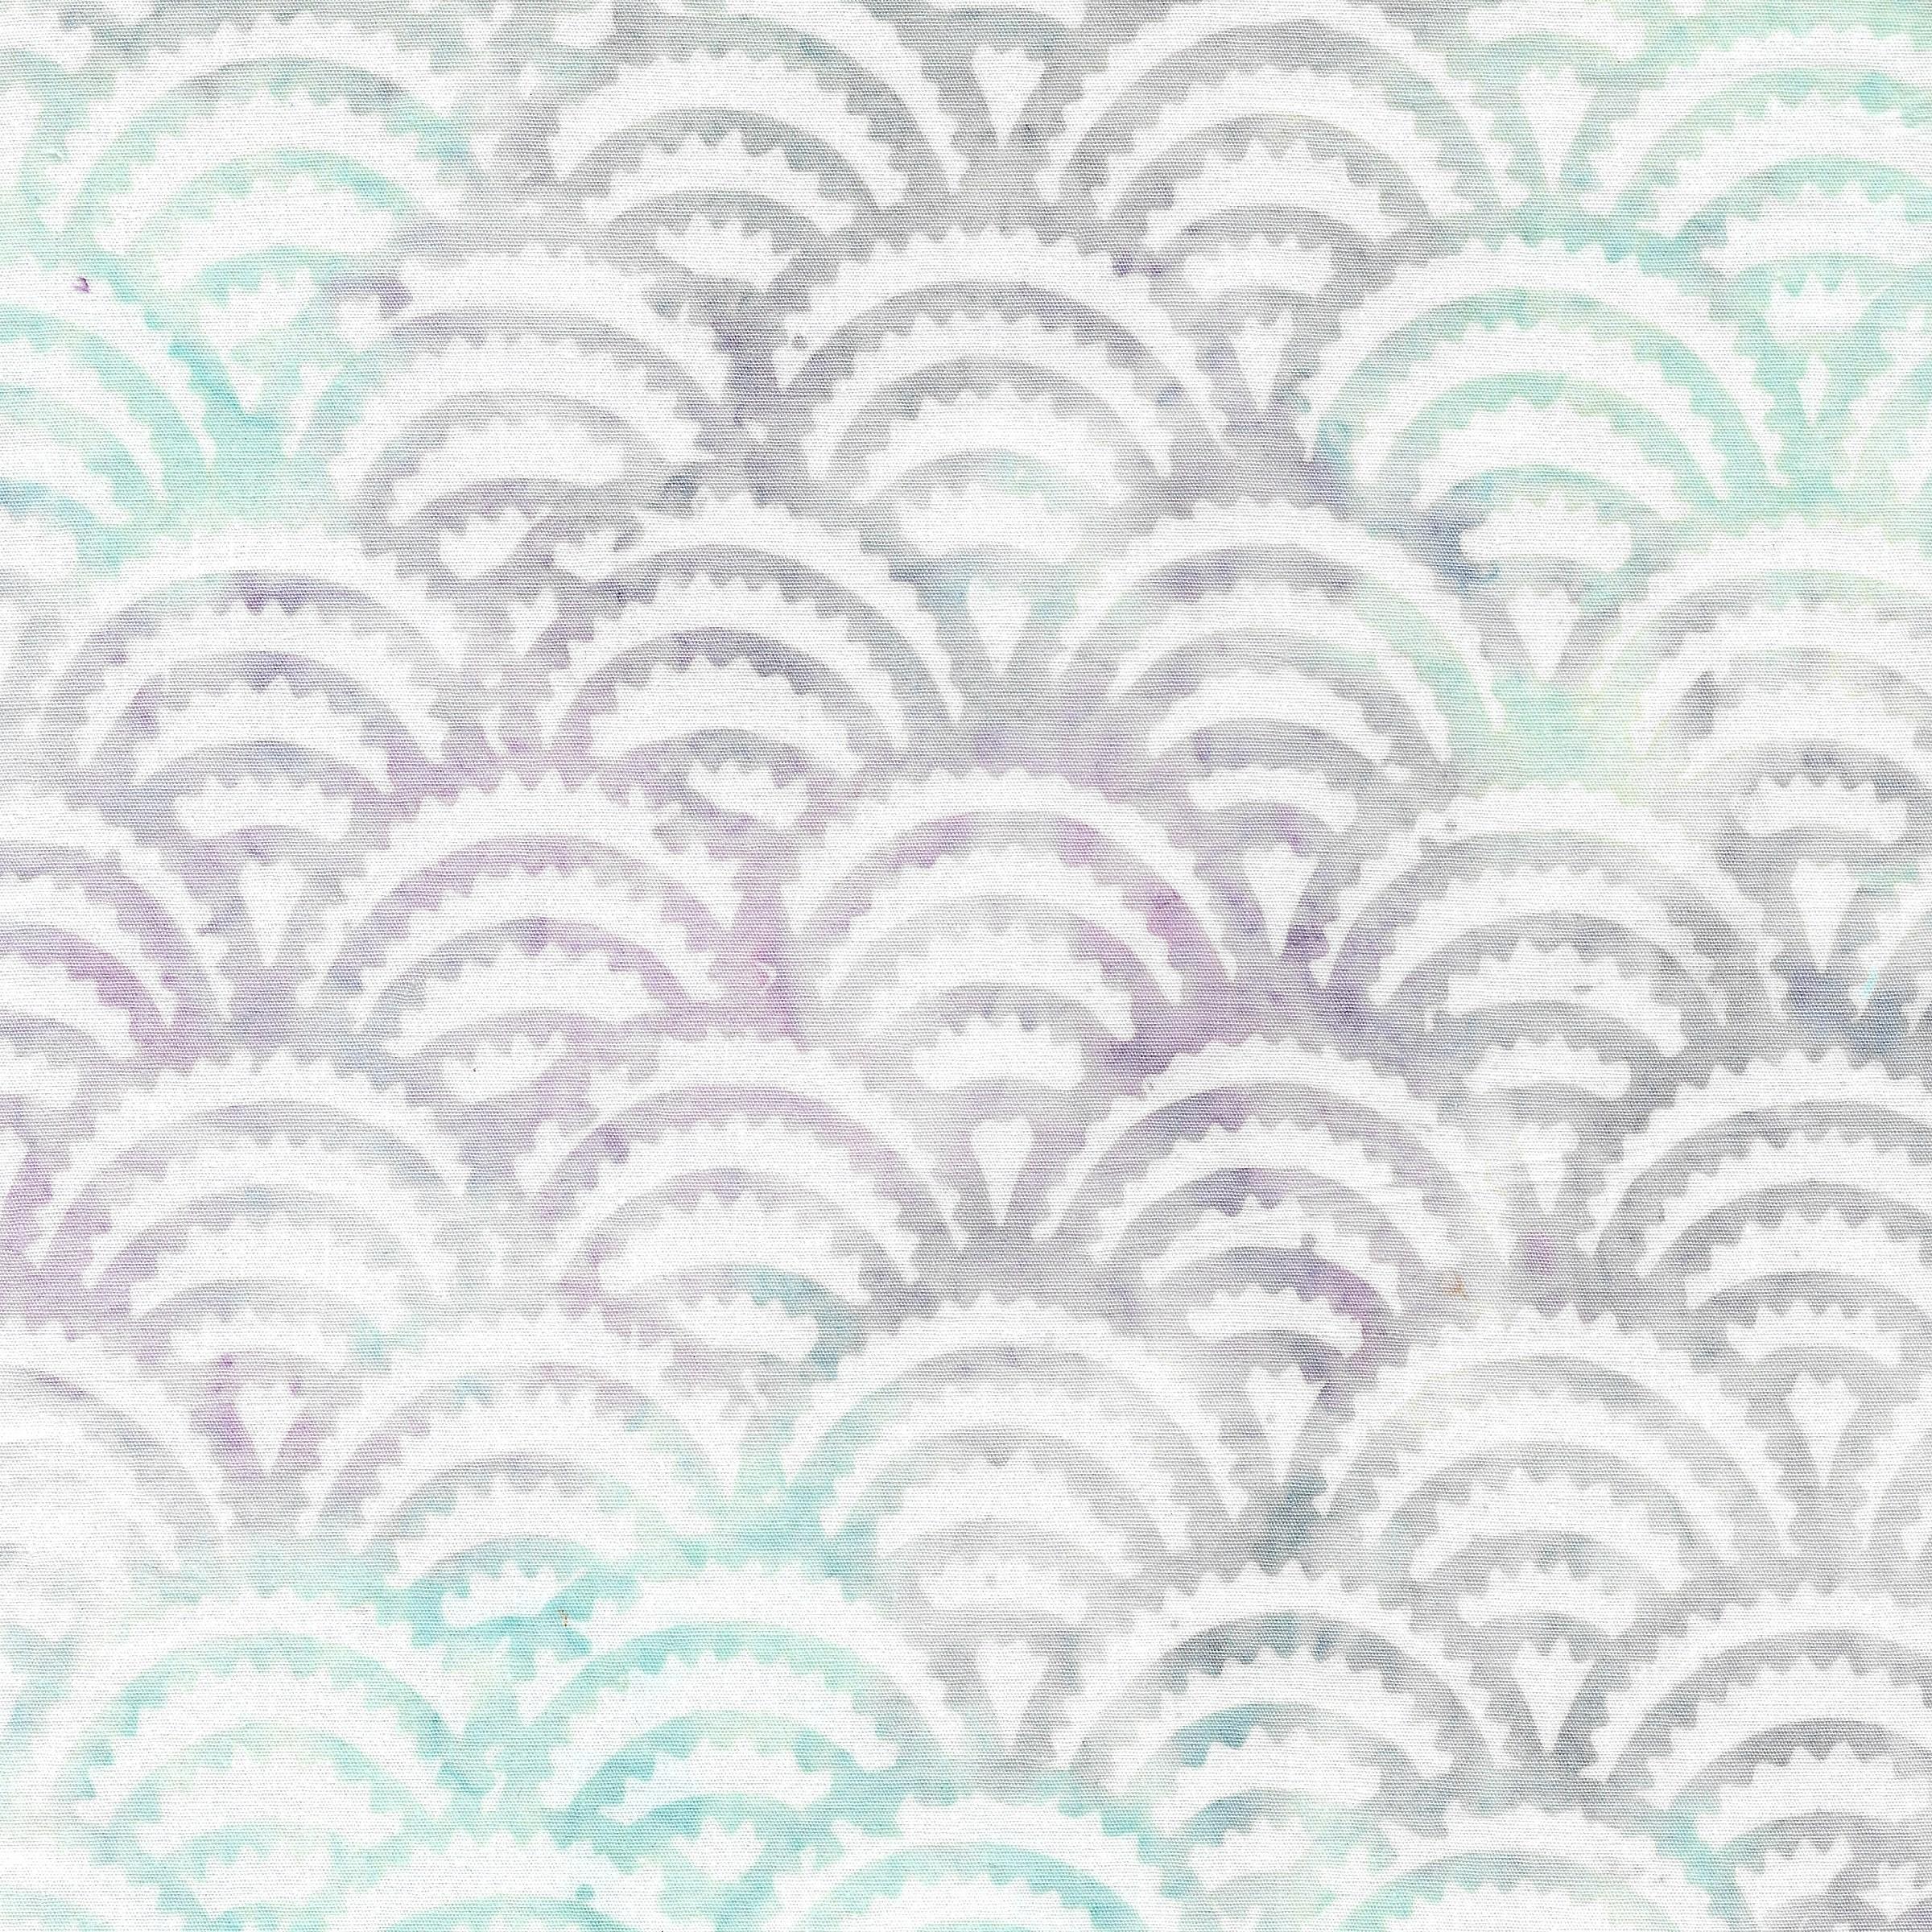 111919831 / Ogee Spikes -Opal